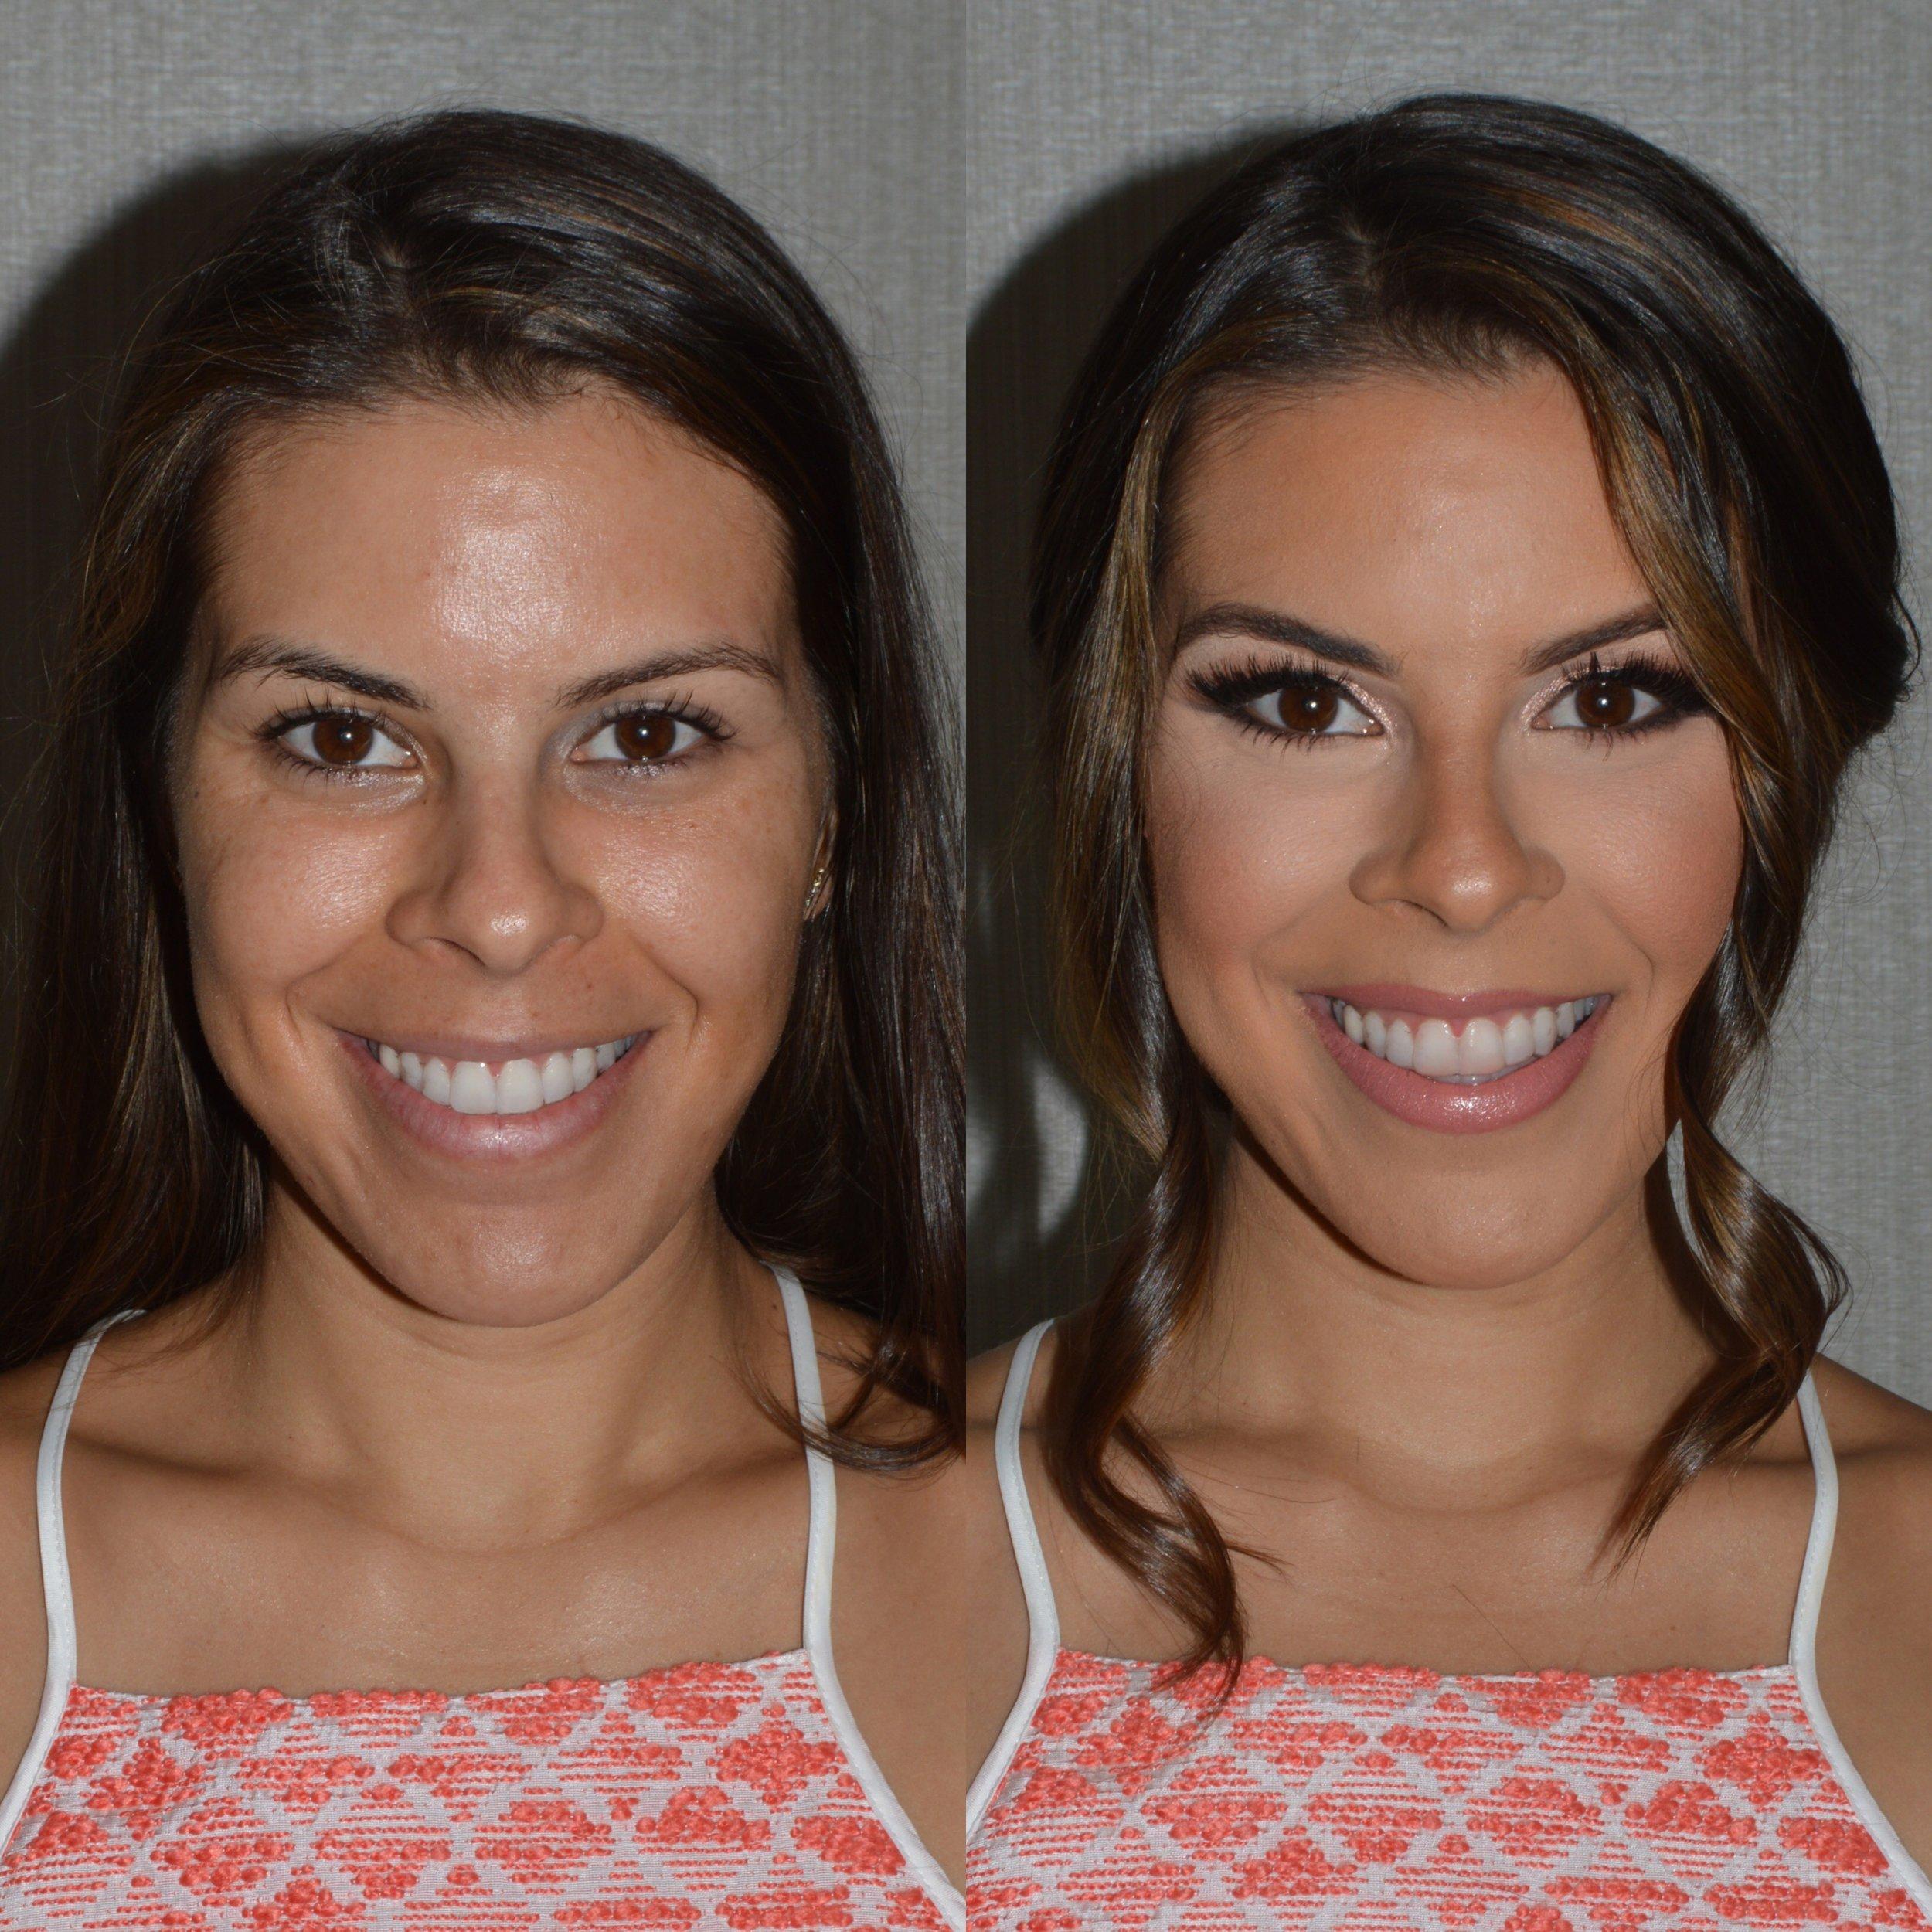 Patricia_Castro_Makeup_Los_Angeles_Makeup_Artist_62.JPG